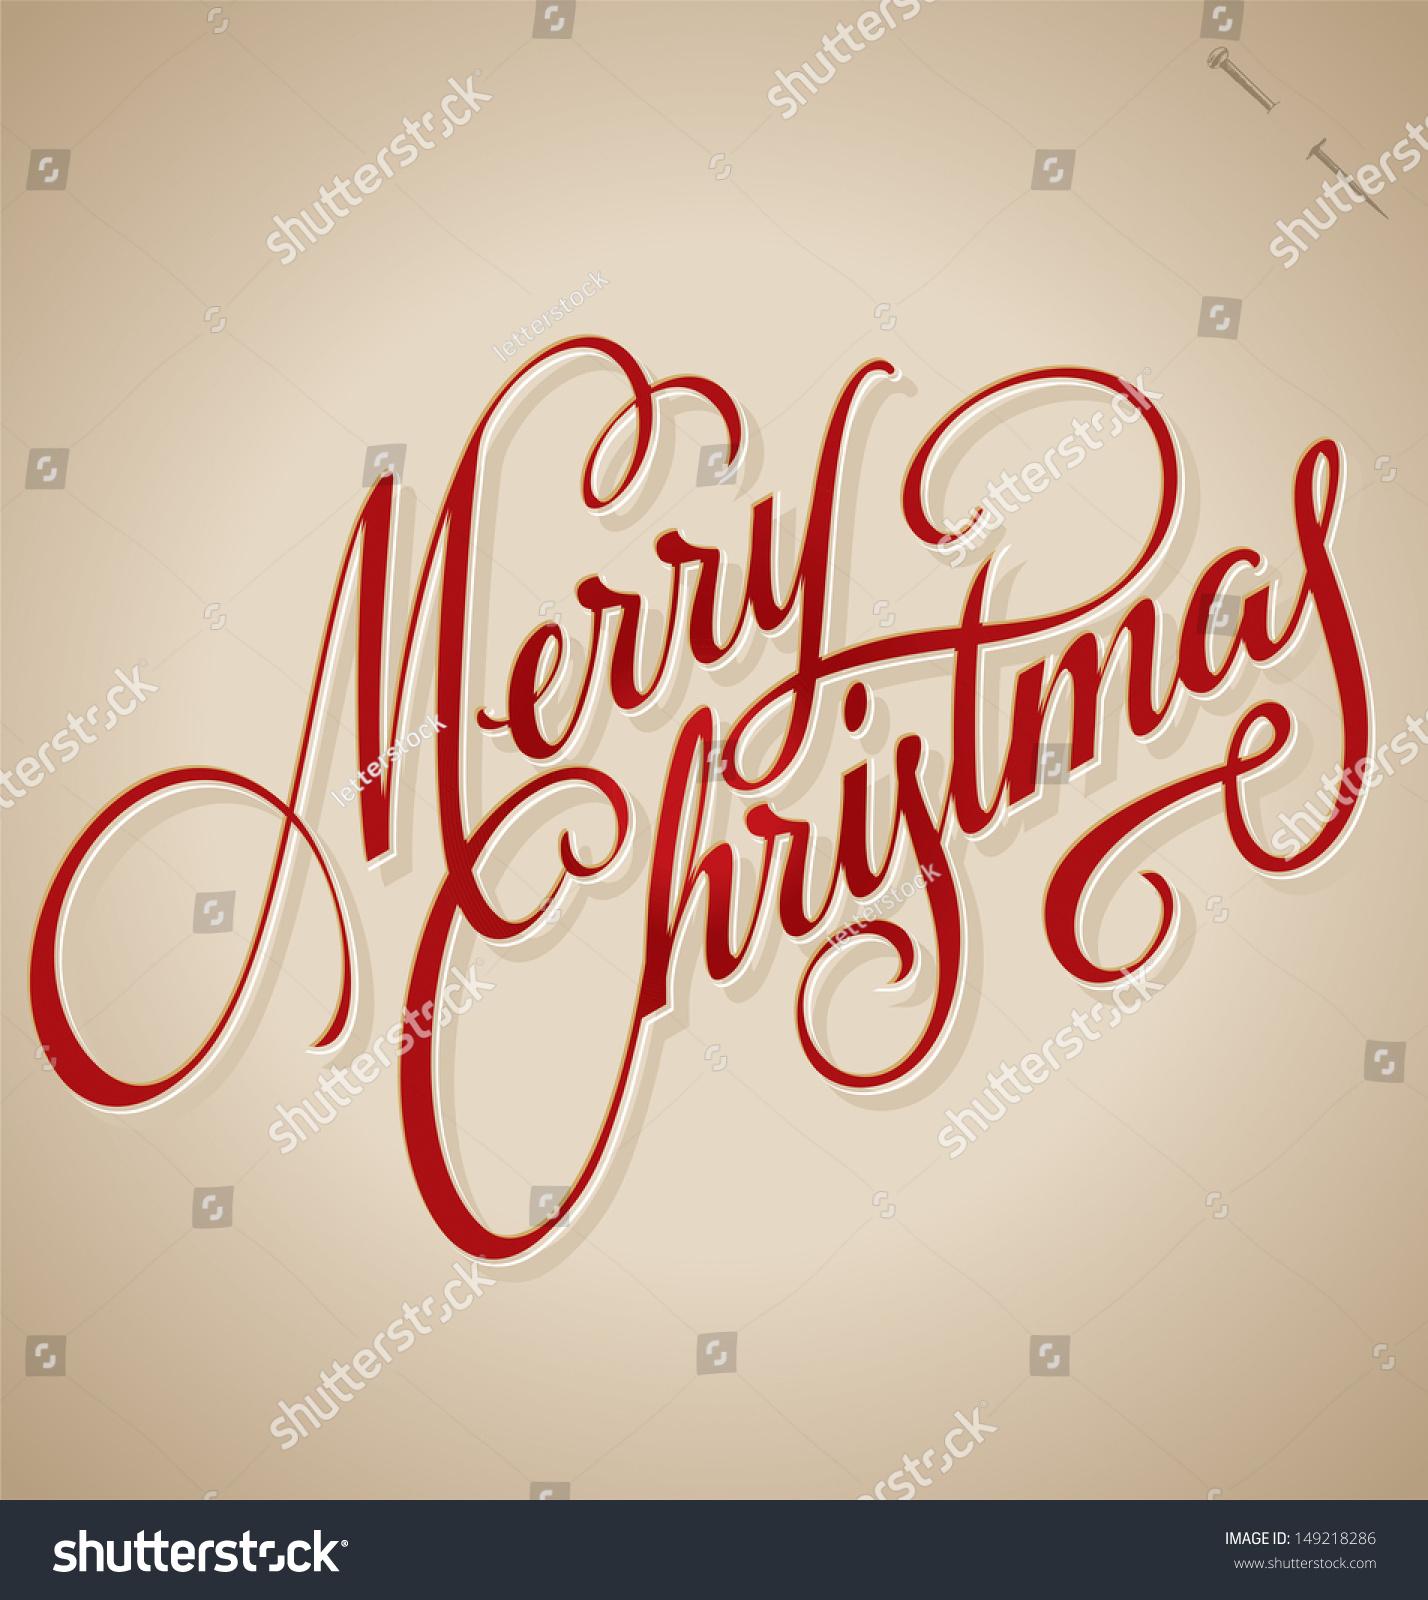 Merry Christmas Hand Lettering Handmade Calligraphy Stock